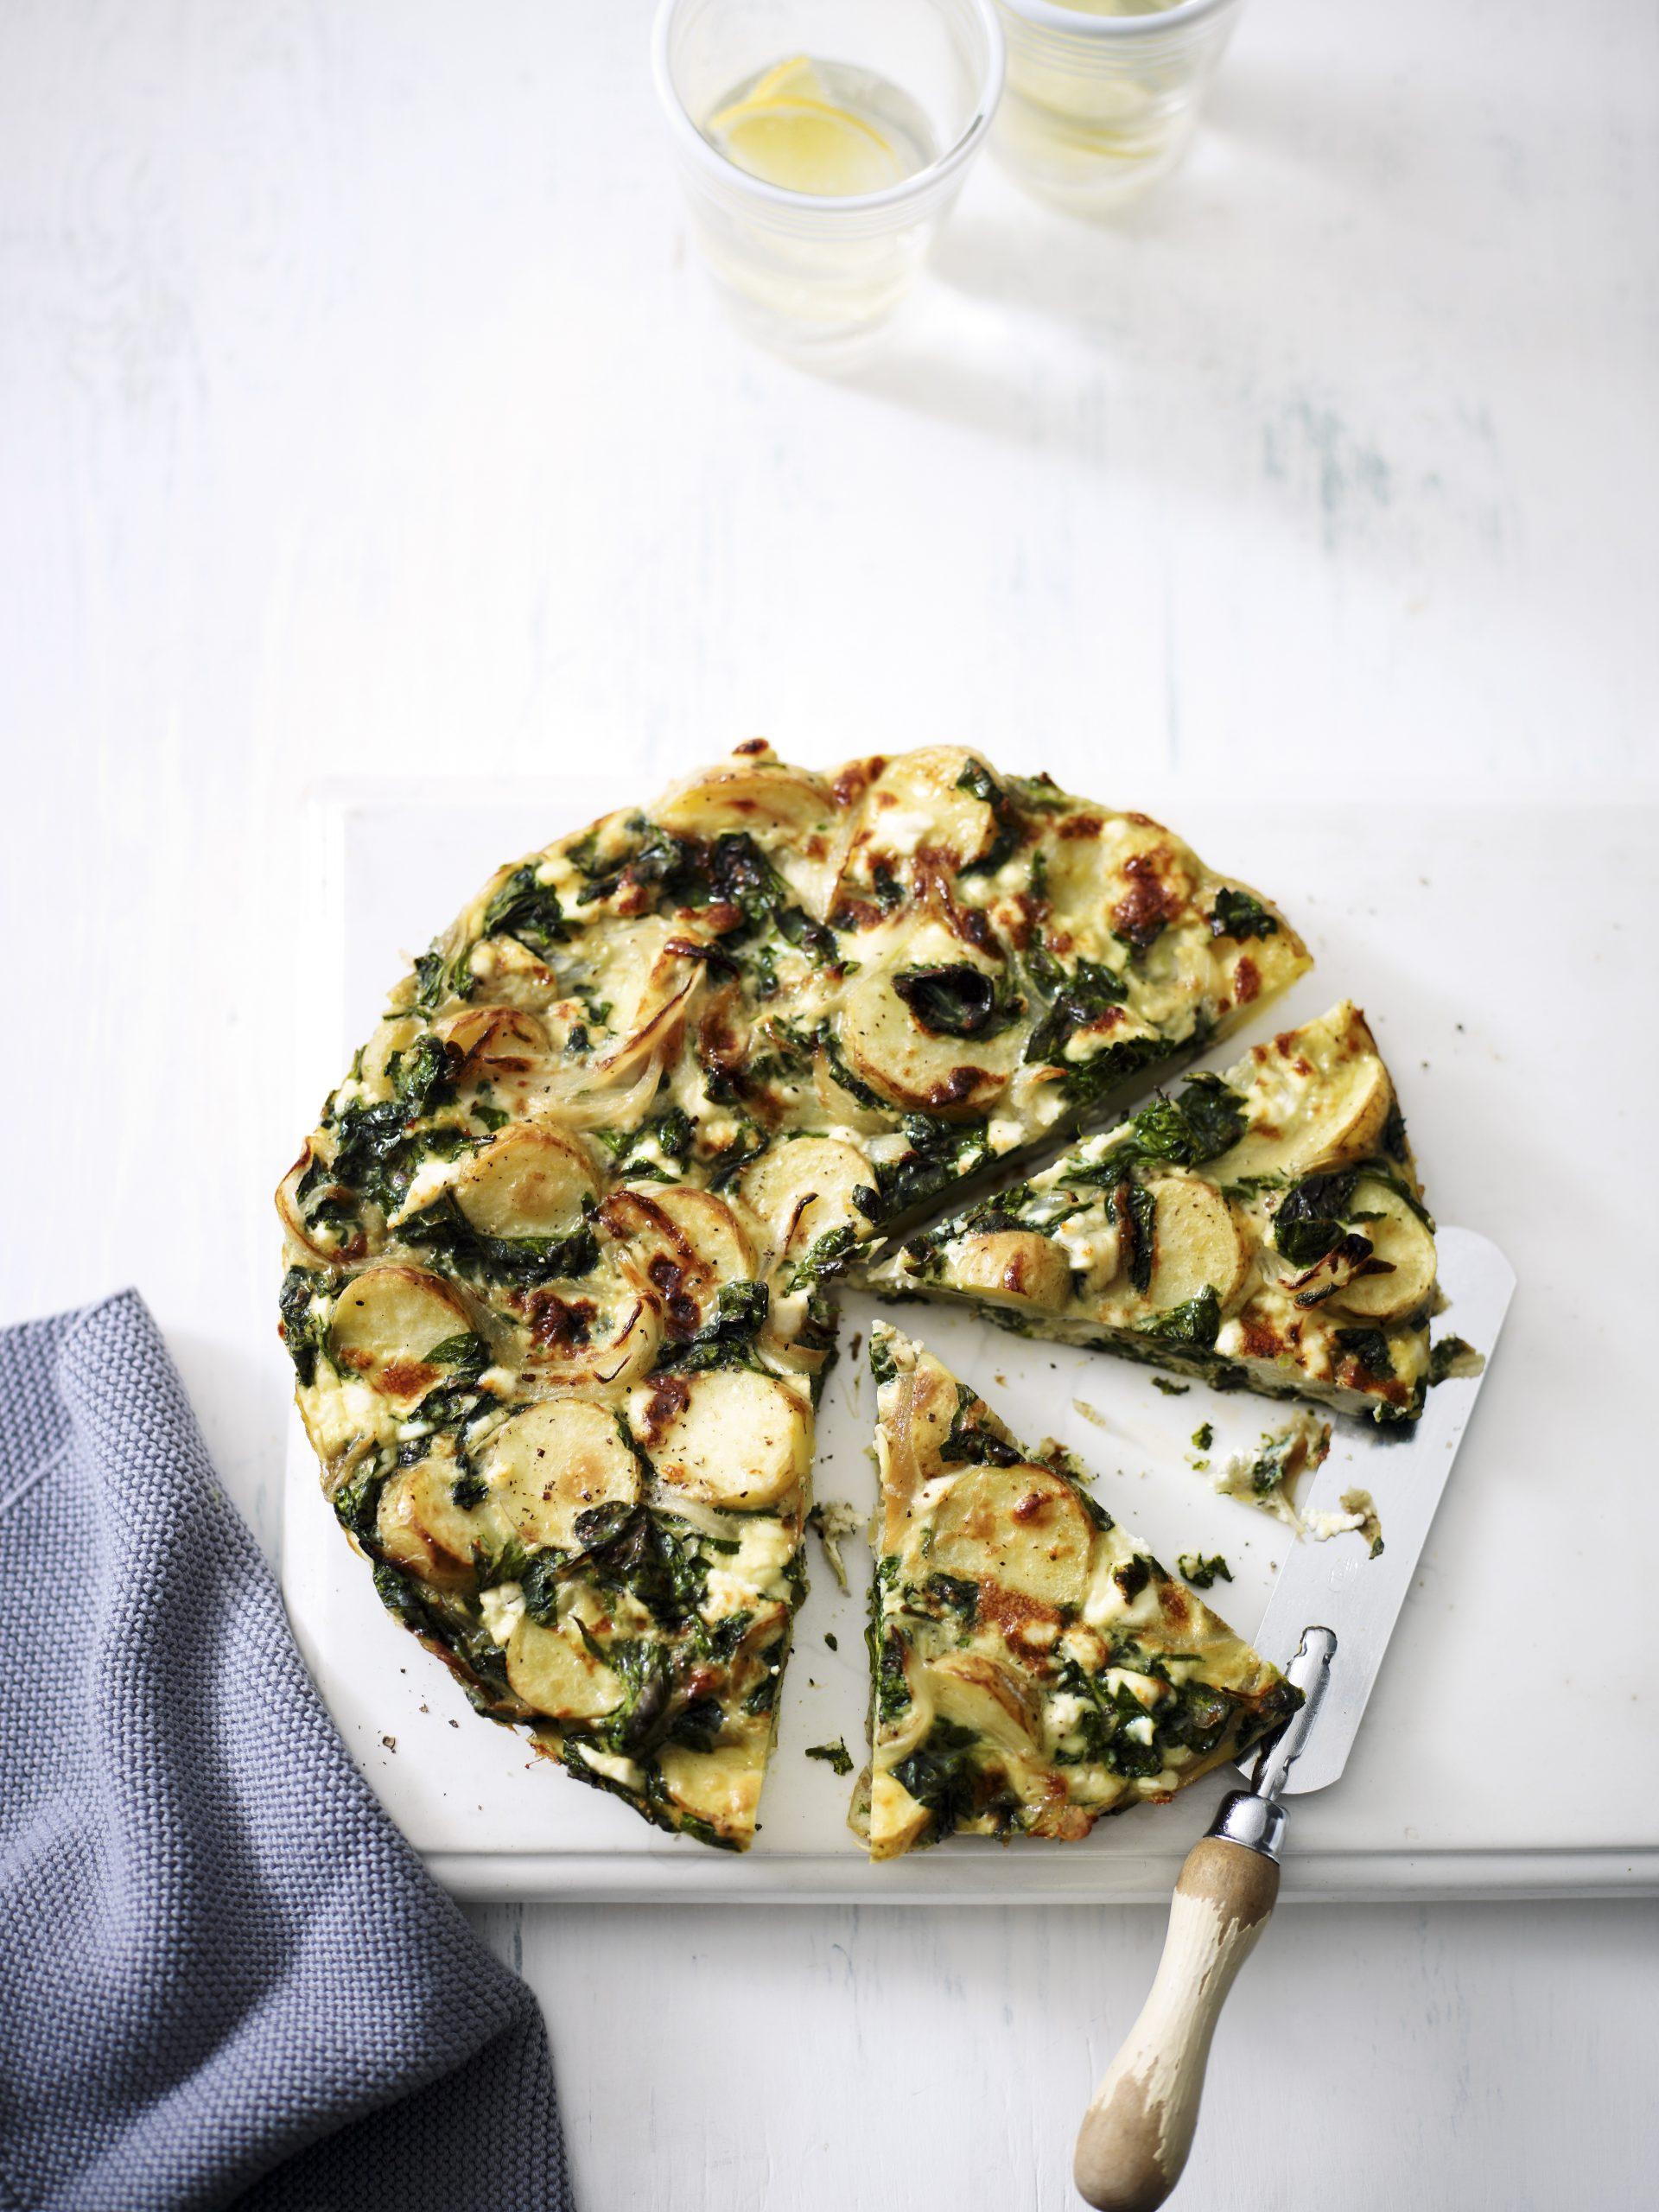 Recipe: Spinach & ricotta Spanish omelette